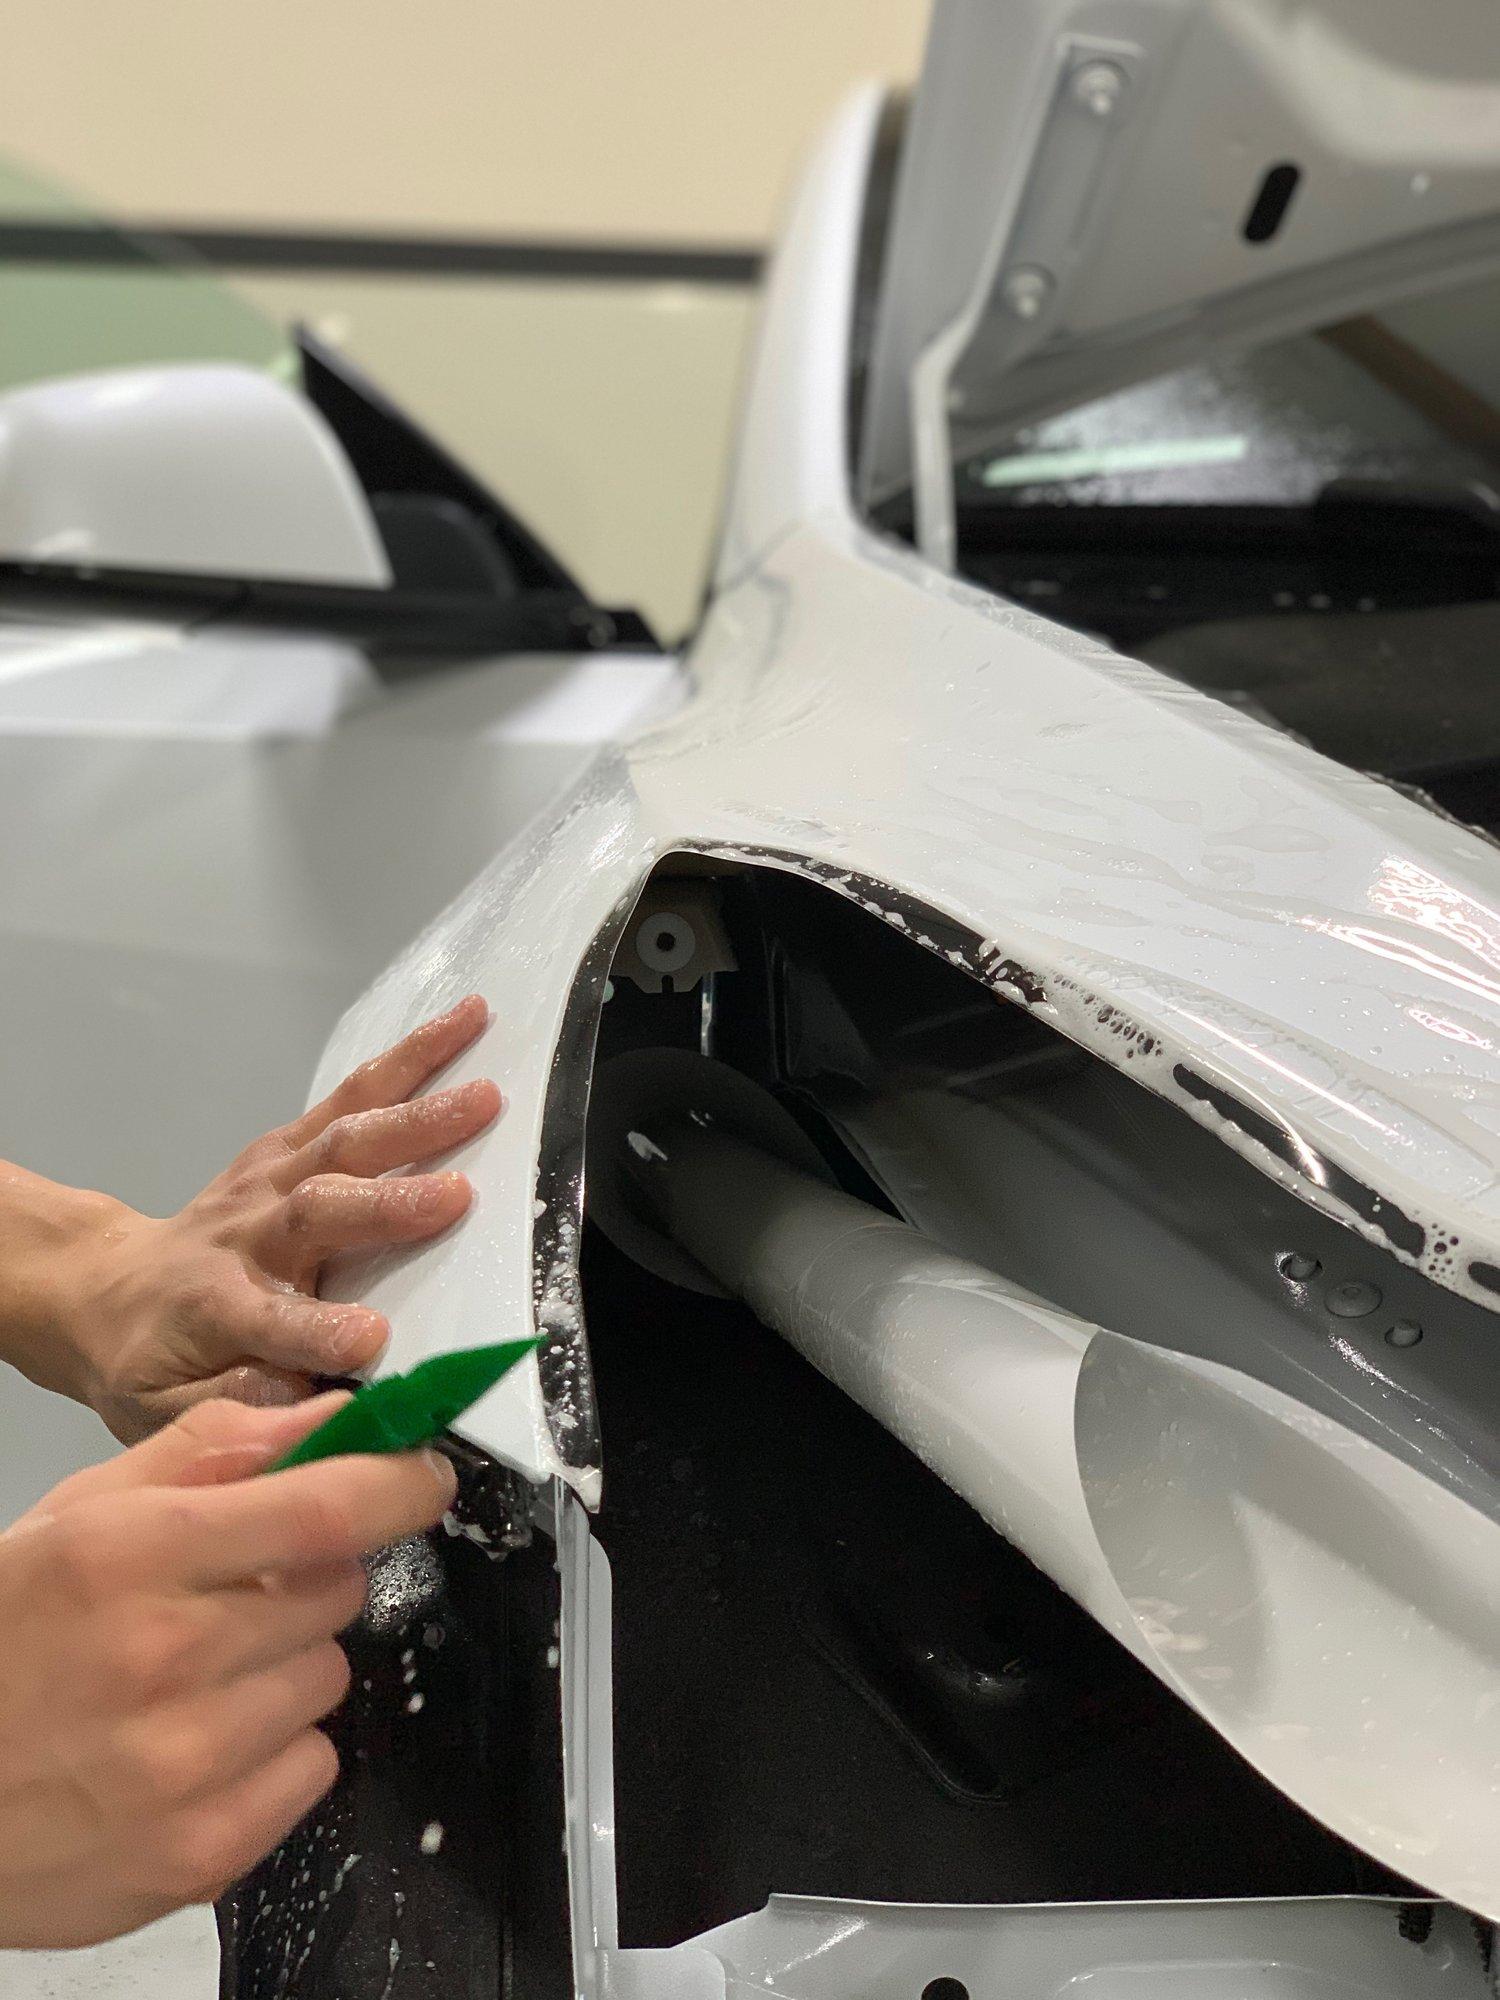 2020 Tesla Model Y Pearl White Multi-Coat  (Appearance Solutions-Sacramento,CA)~17.JPG